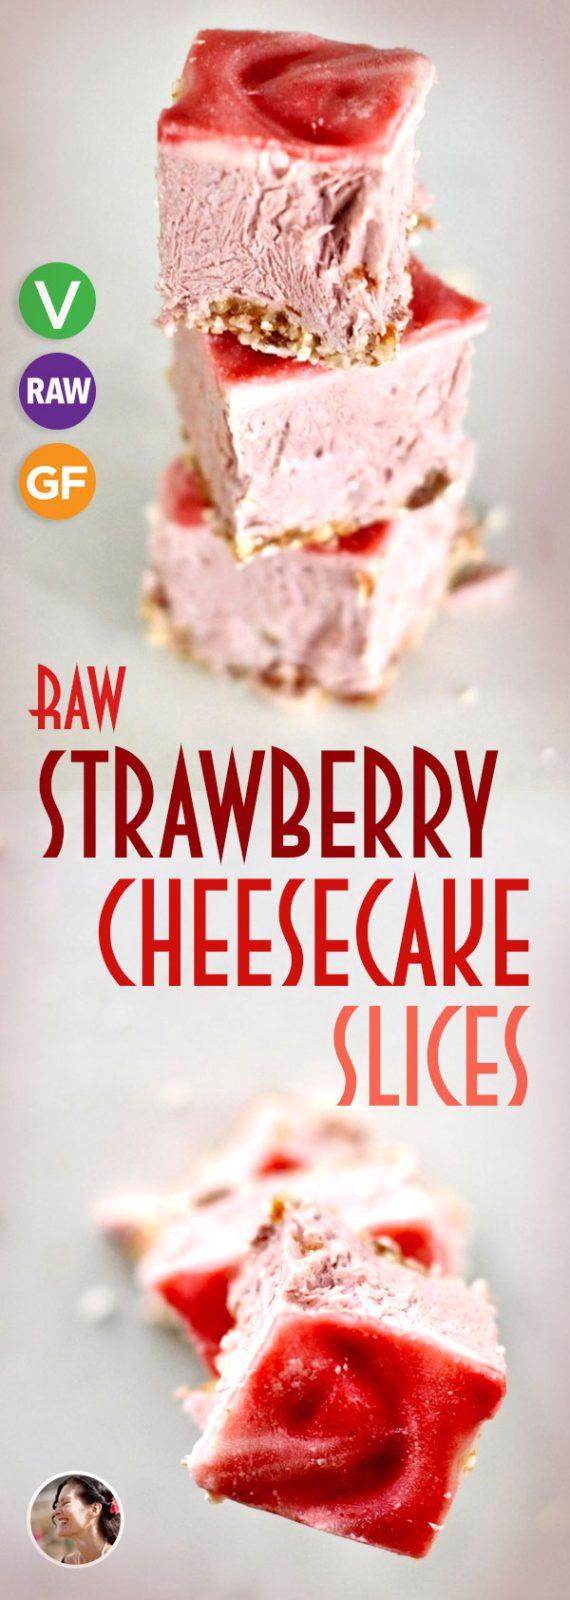 Raw Strawberry Cheesecake Slices (Vegan, Gluten Free)